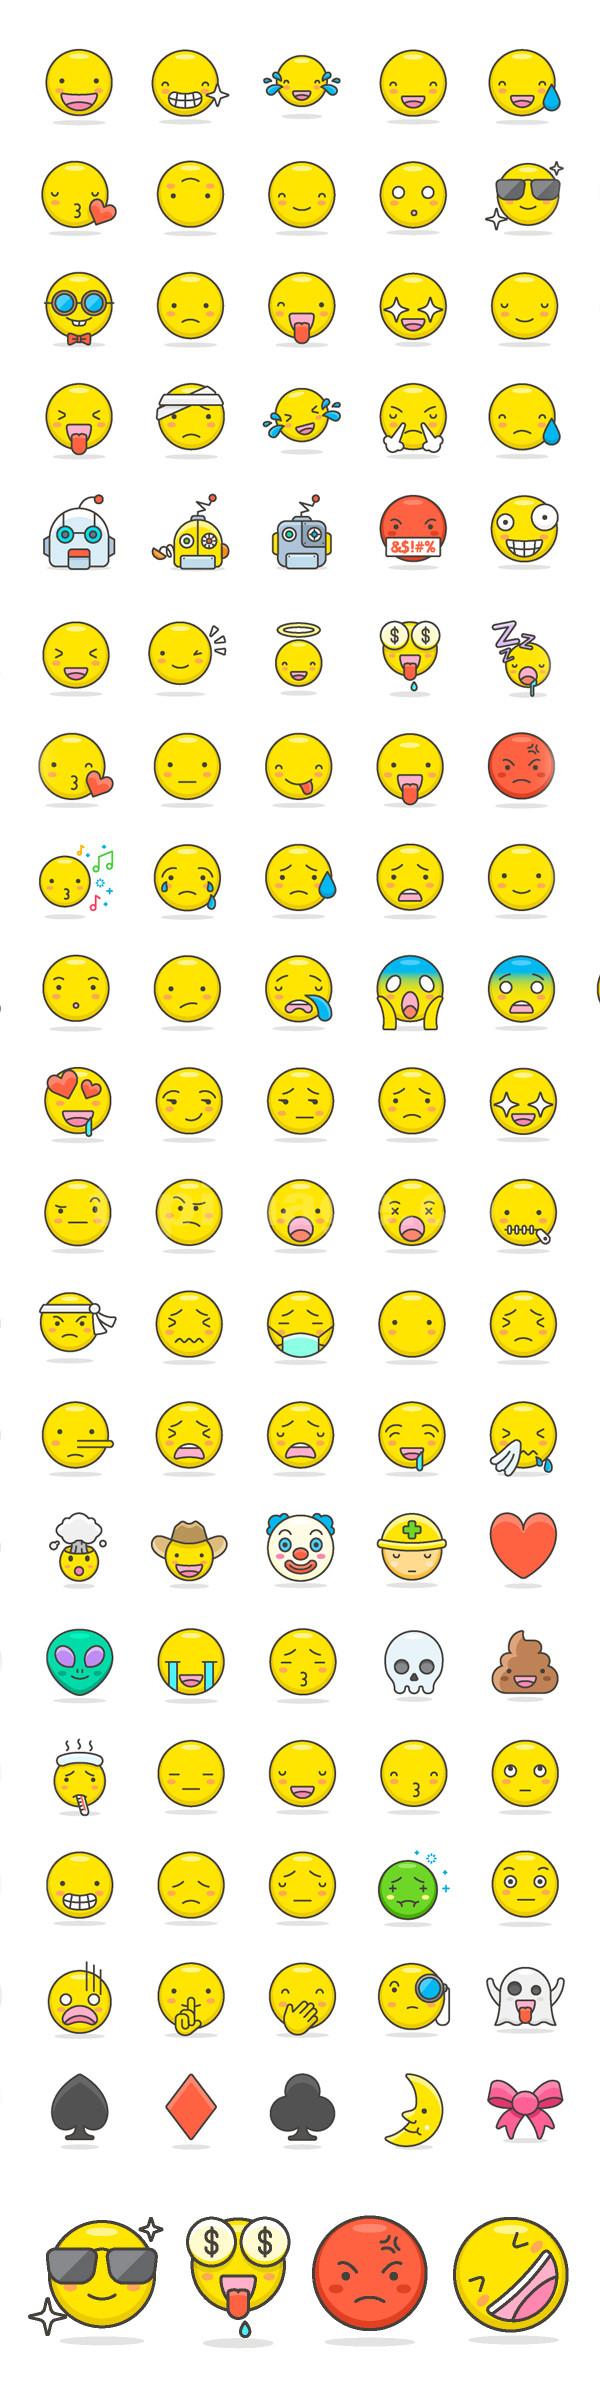 emoji可爱表情整套ai矢量文件下载